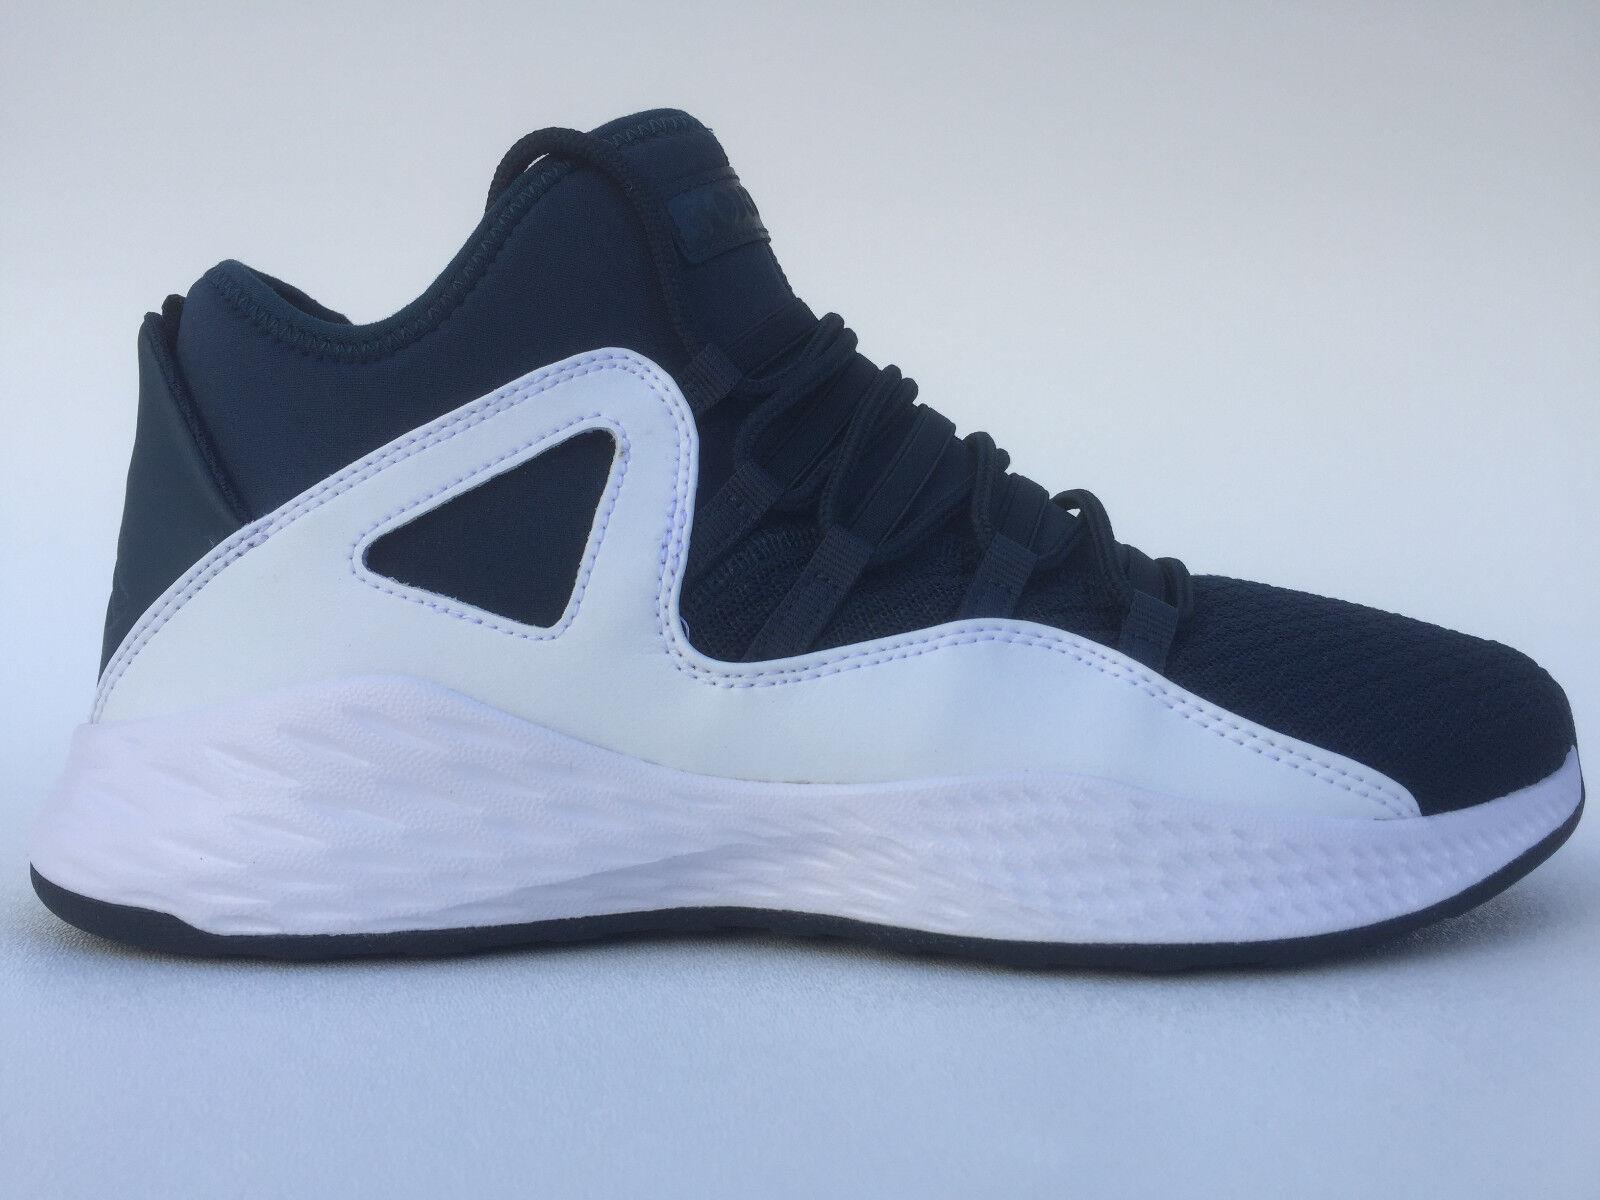 hommes Chaussures NIKE JORDAN Formula 23 BASKETBALL Chaussures hommes 587a3b